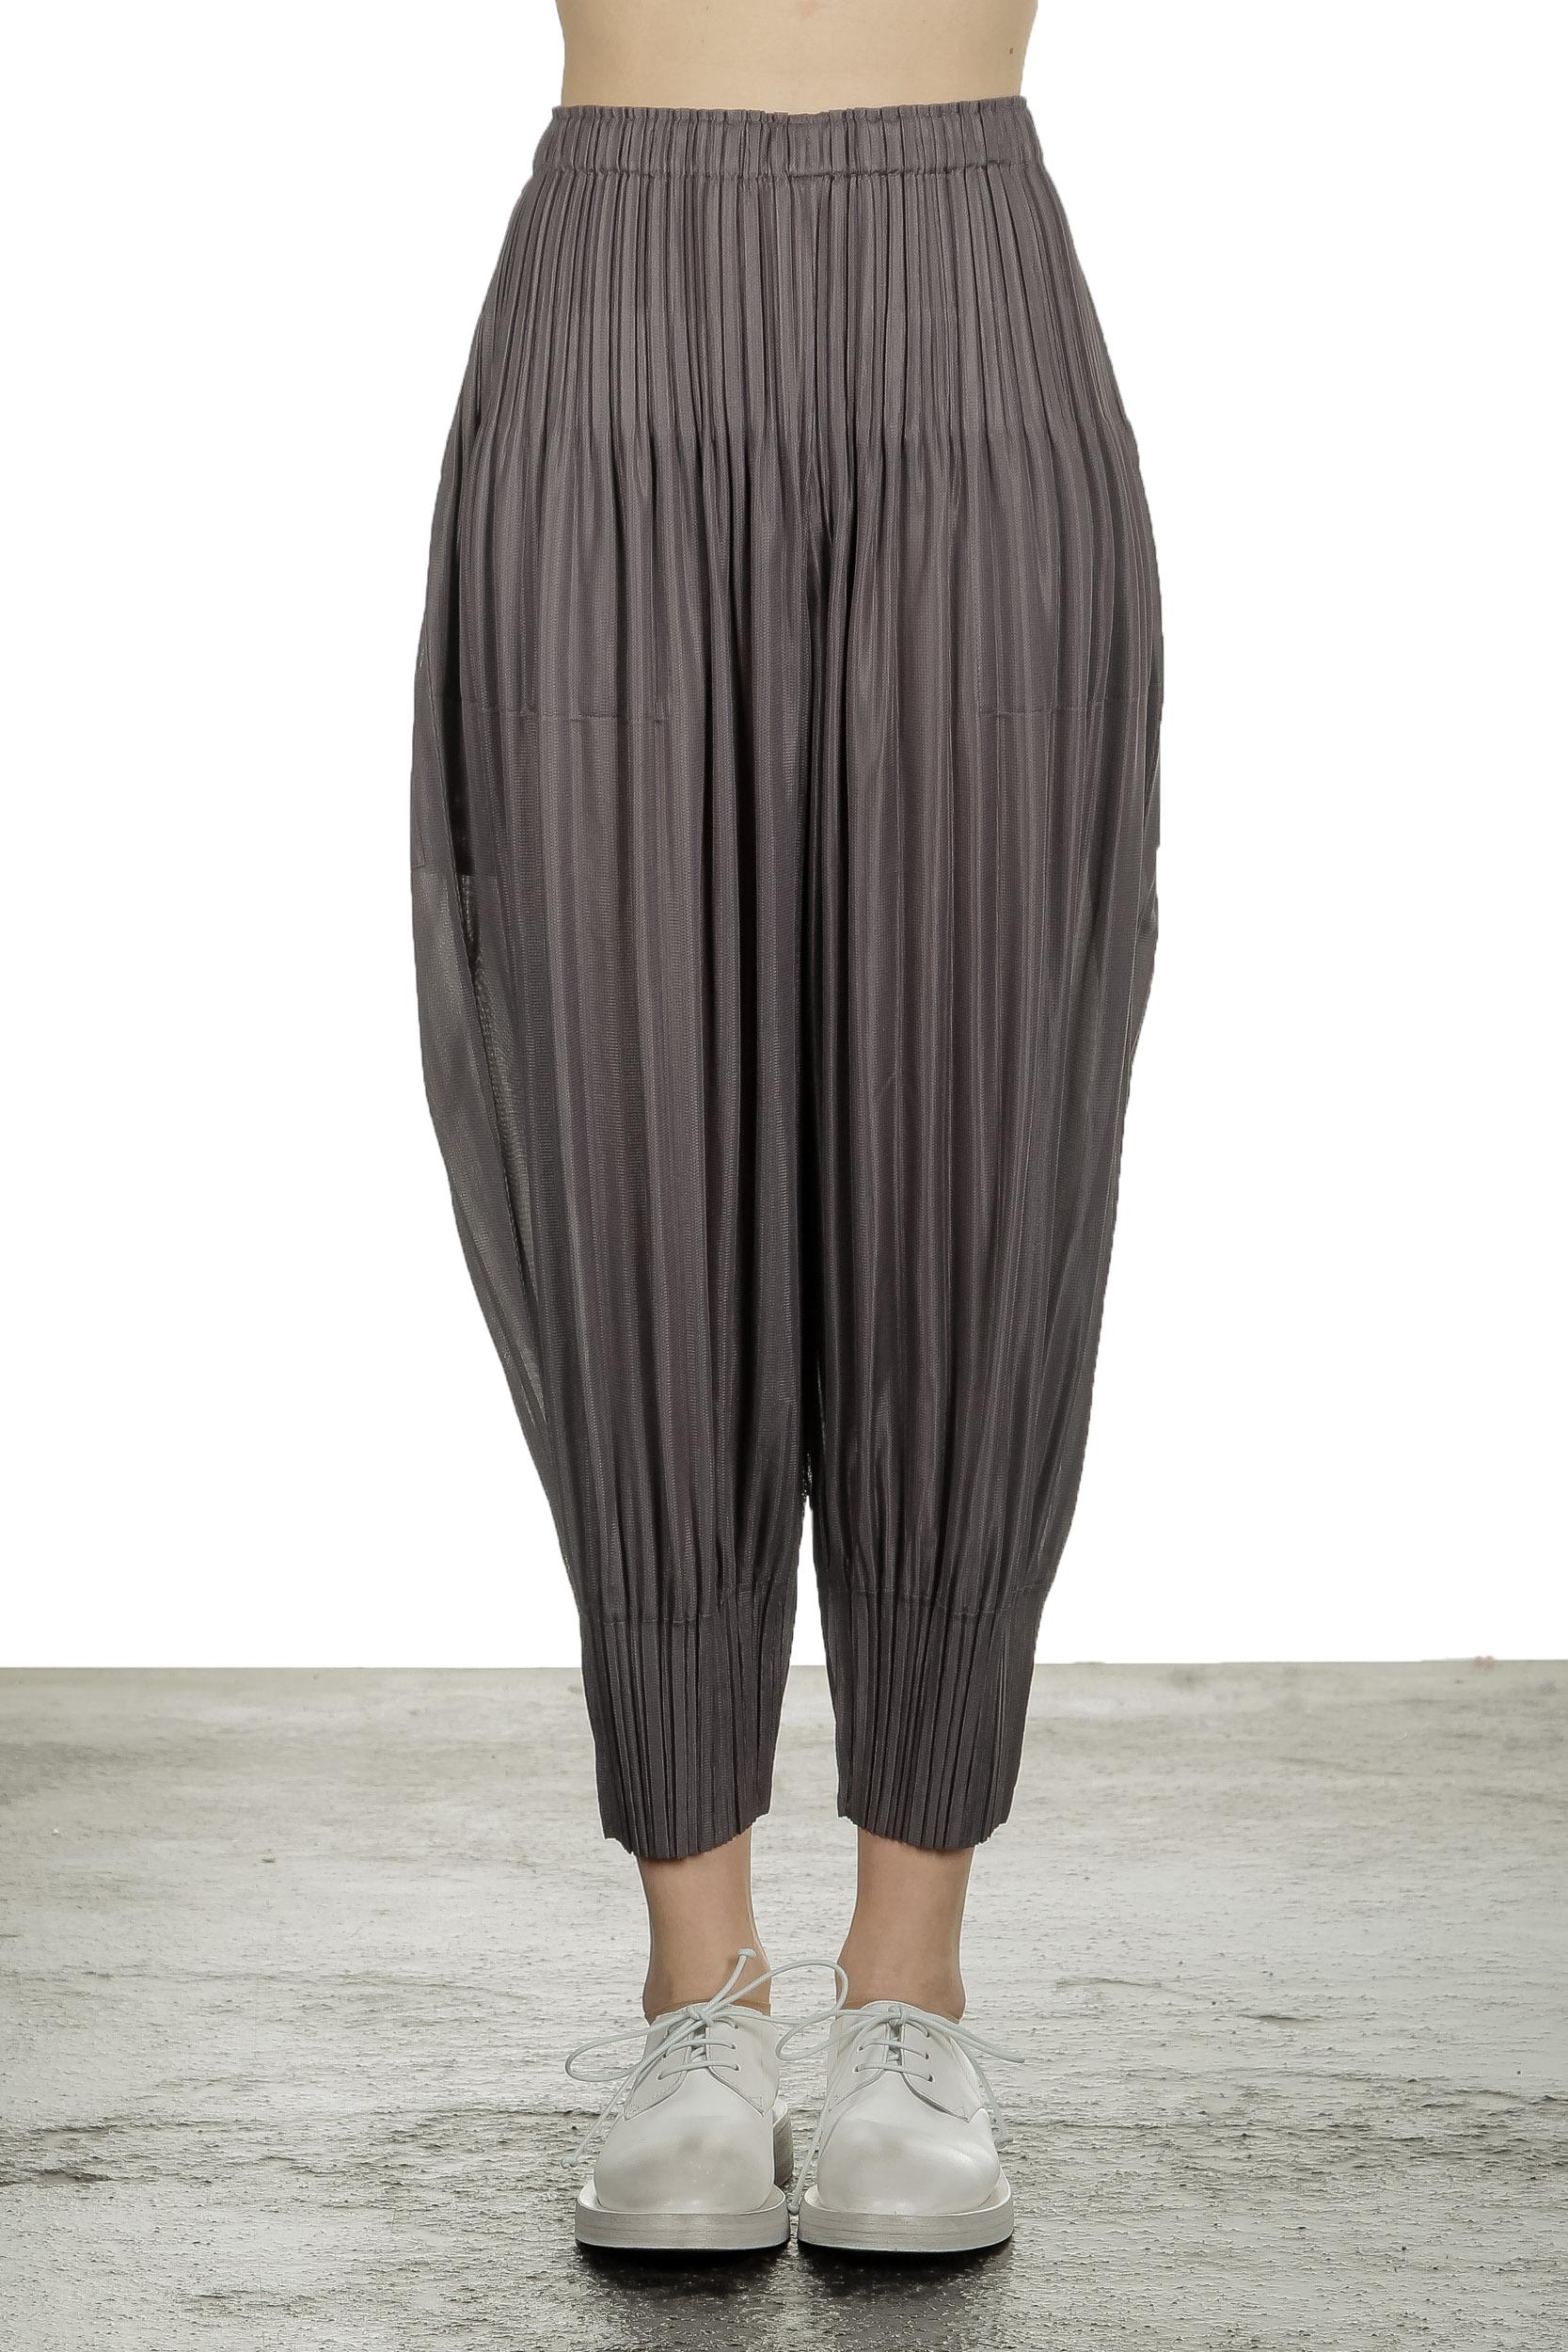 Hosen - Pleats Please Issey Miyake Damen Plissee 7 8 Hose grau  - Onlineshop Luxury Loft